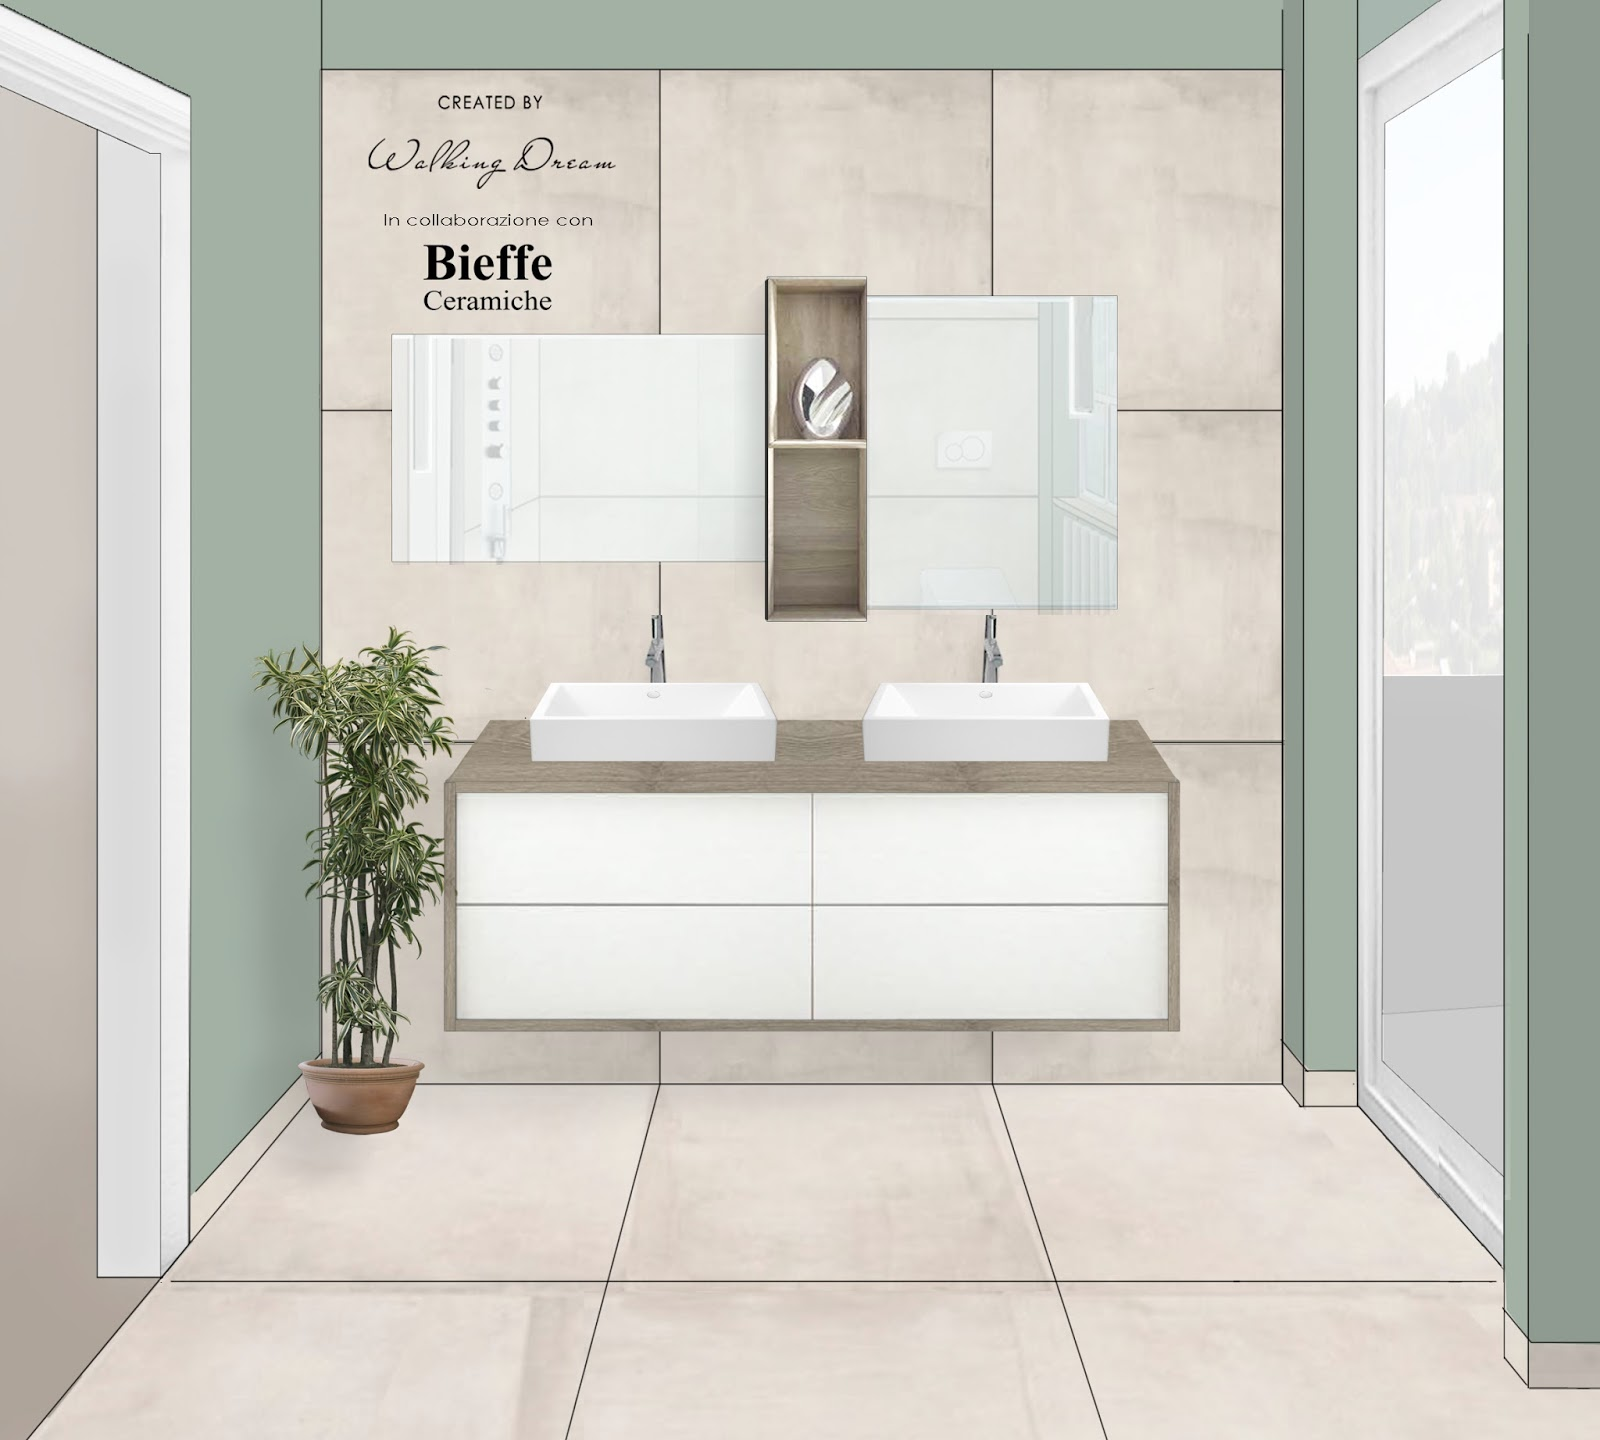 Walking dream sage green bathroom project - Bagno verde salvia ...